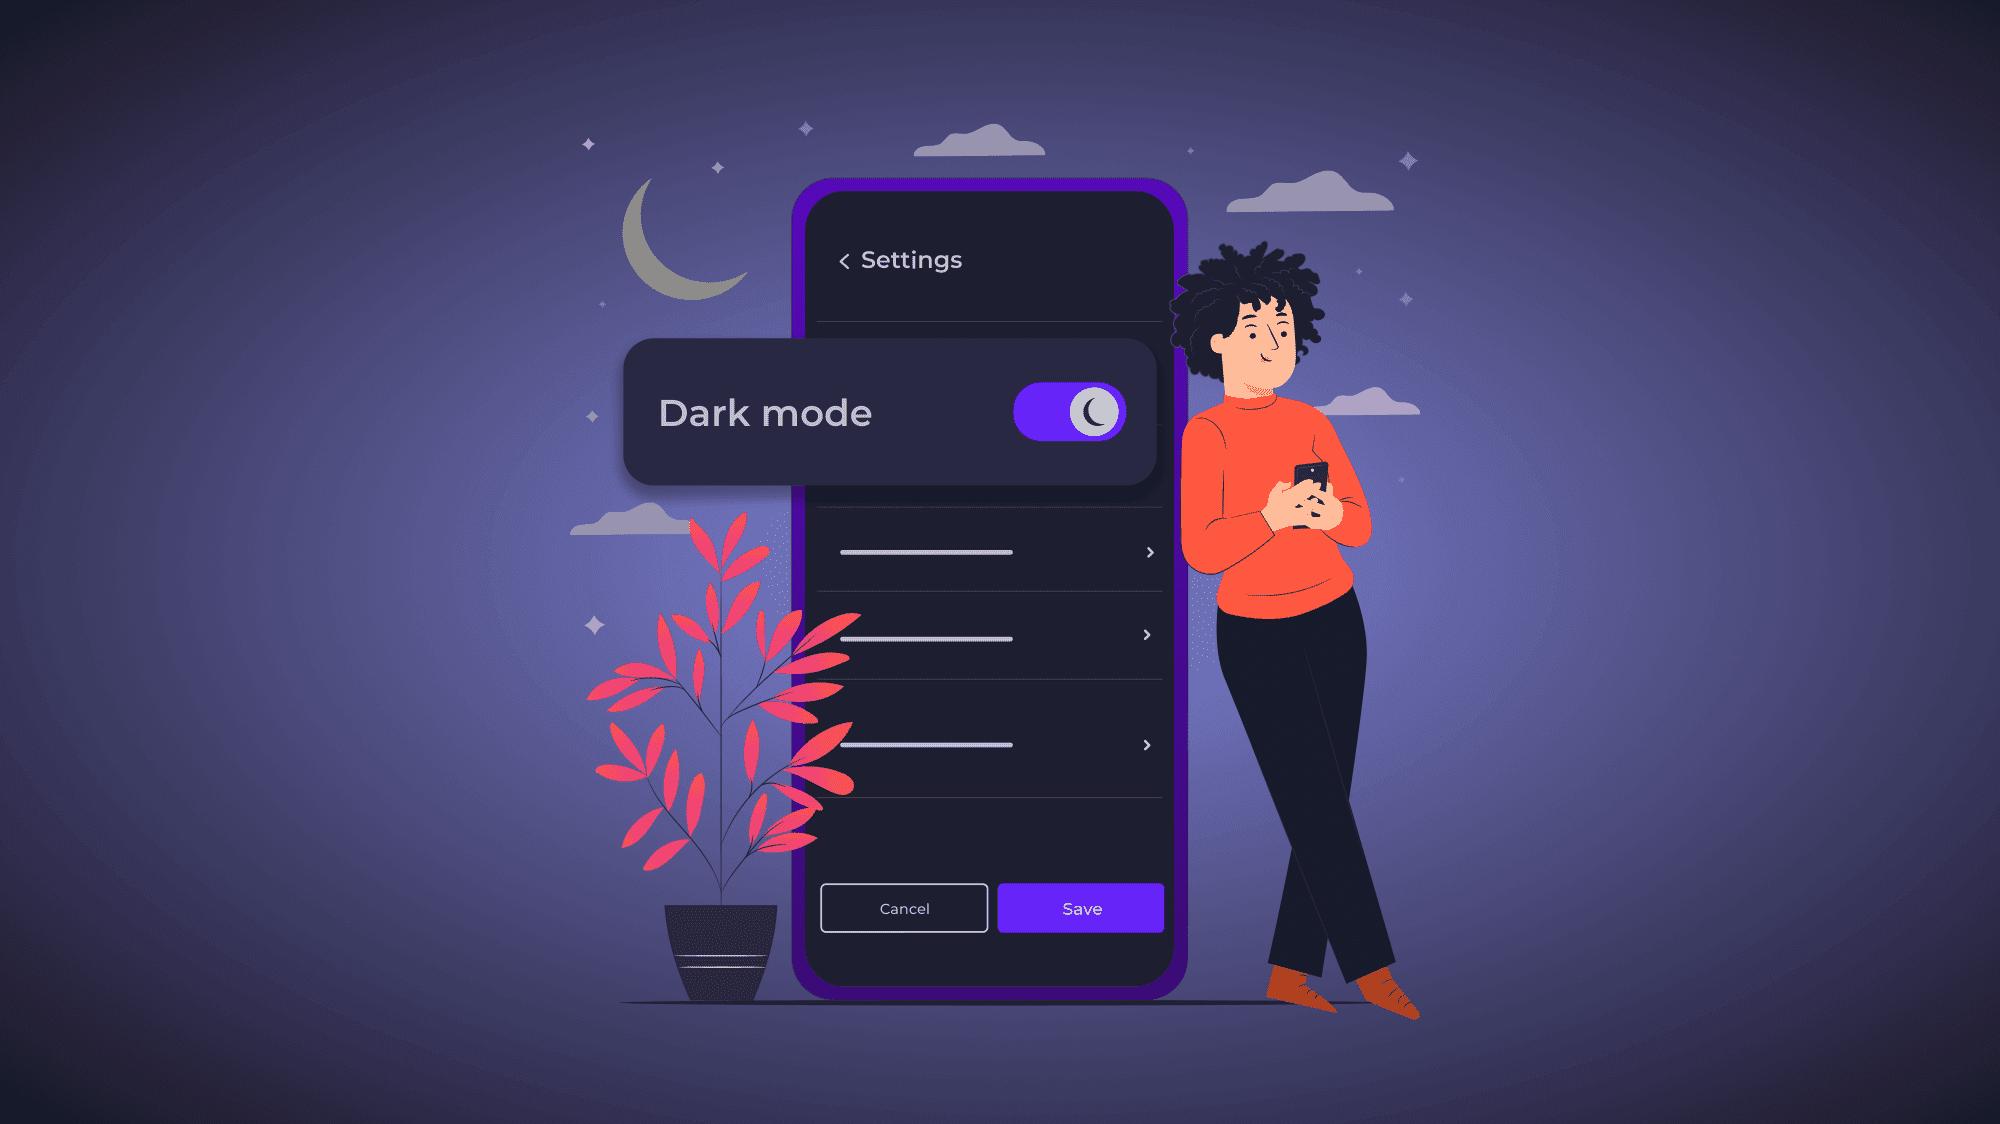 LocalCryptos Dark Mode